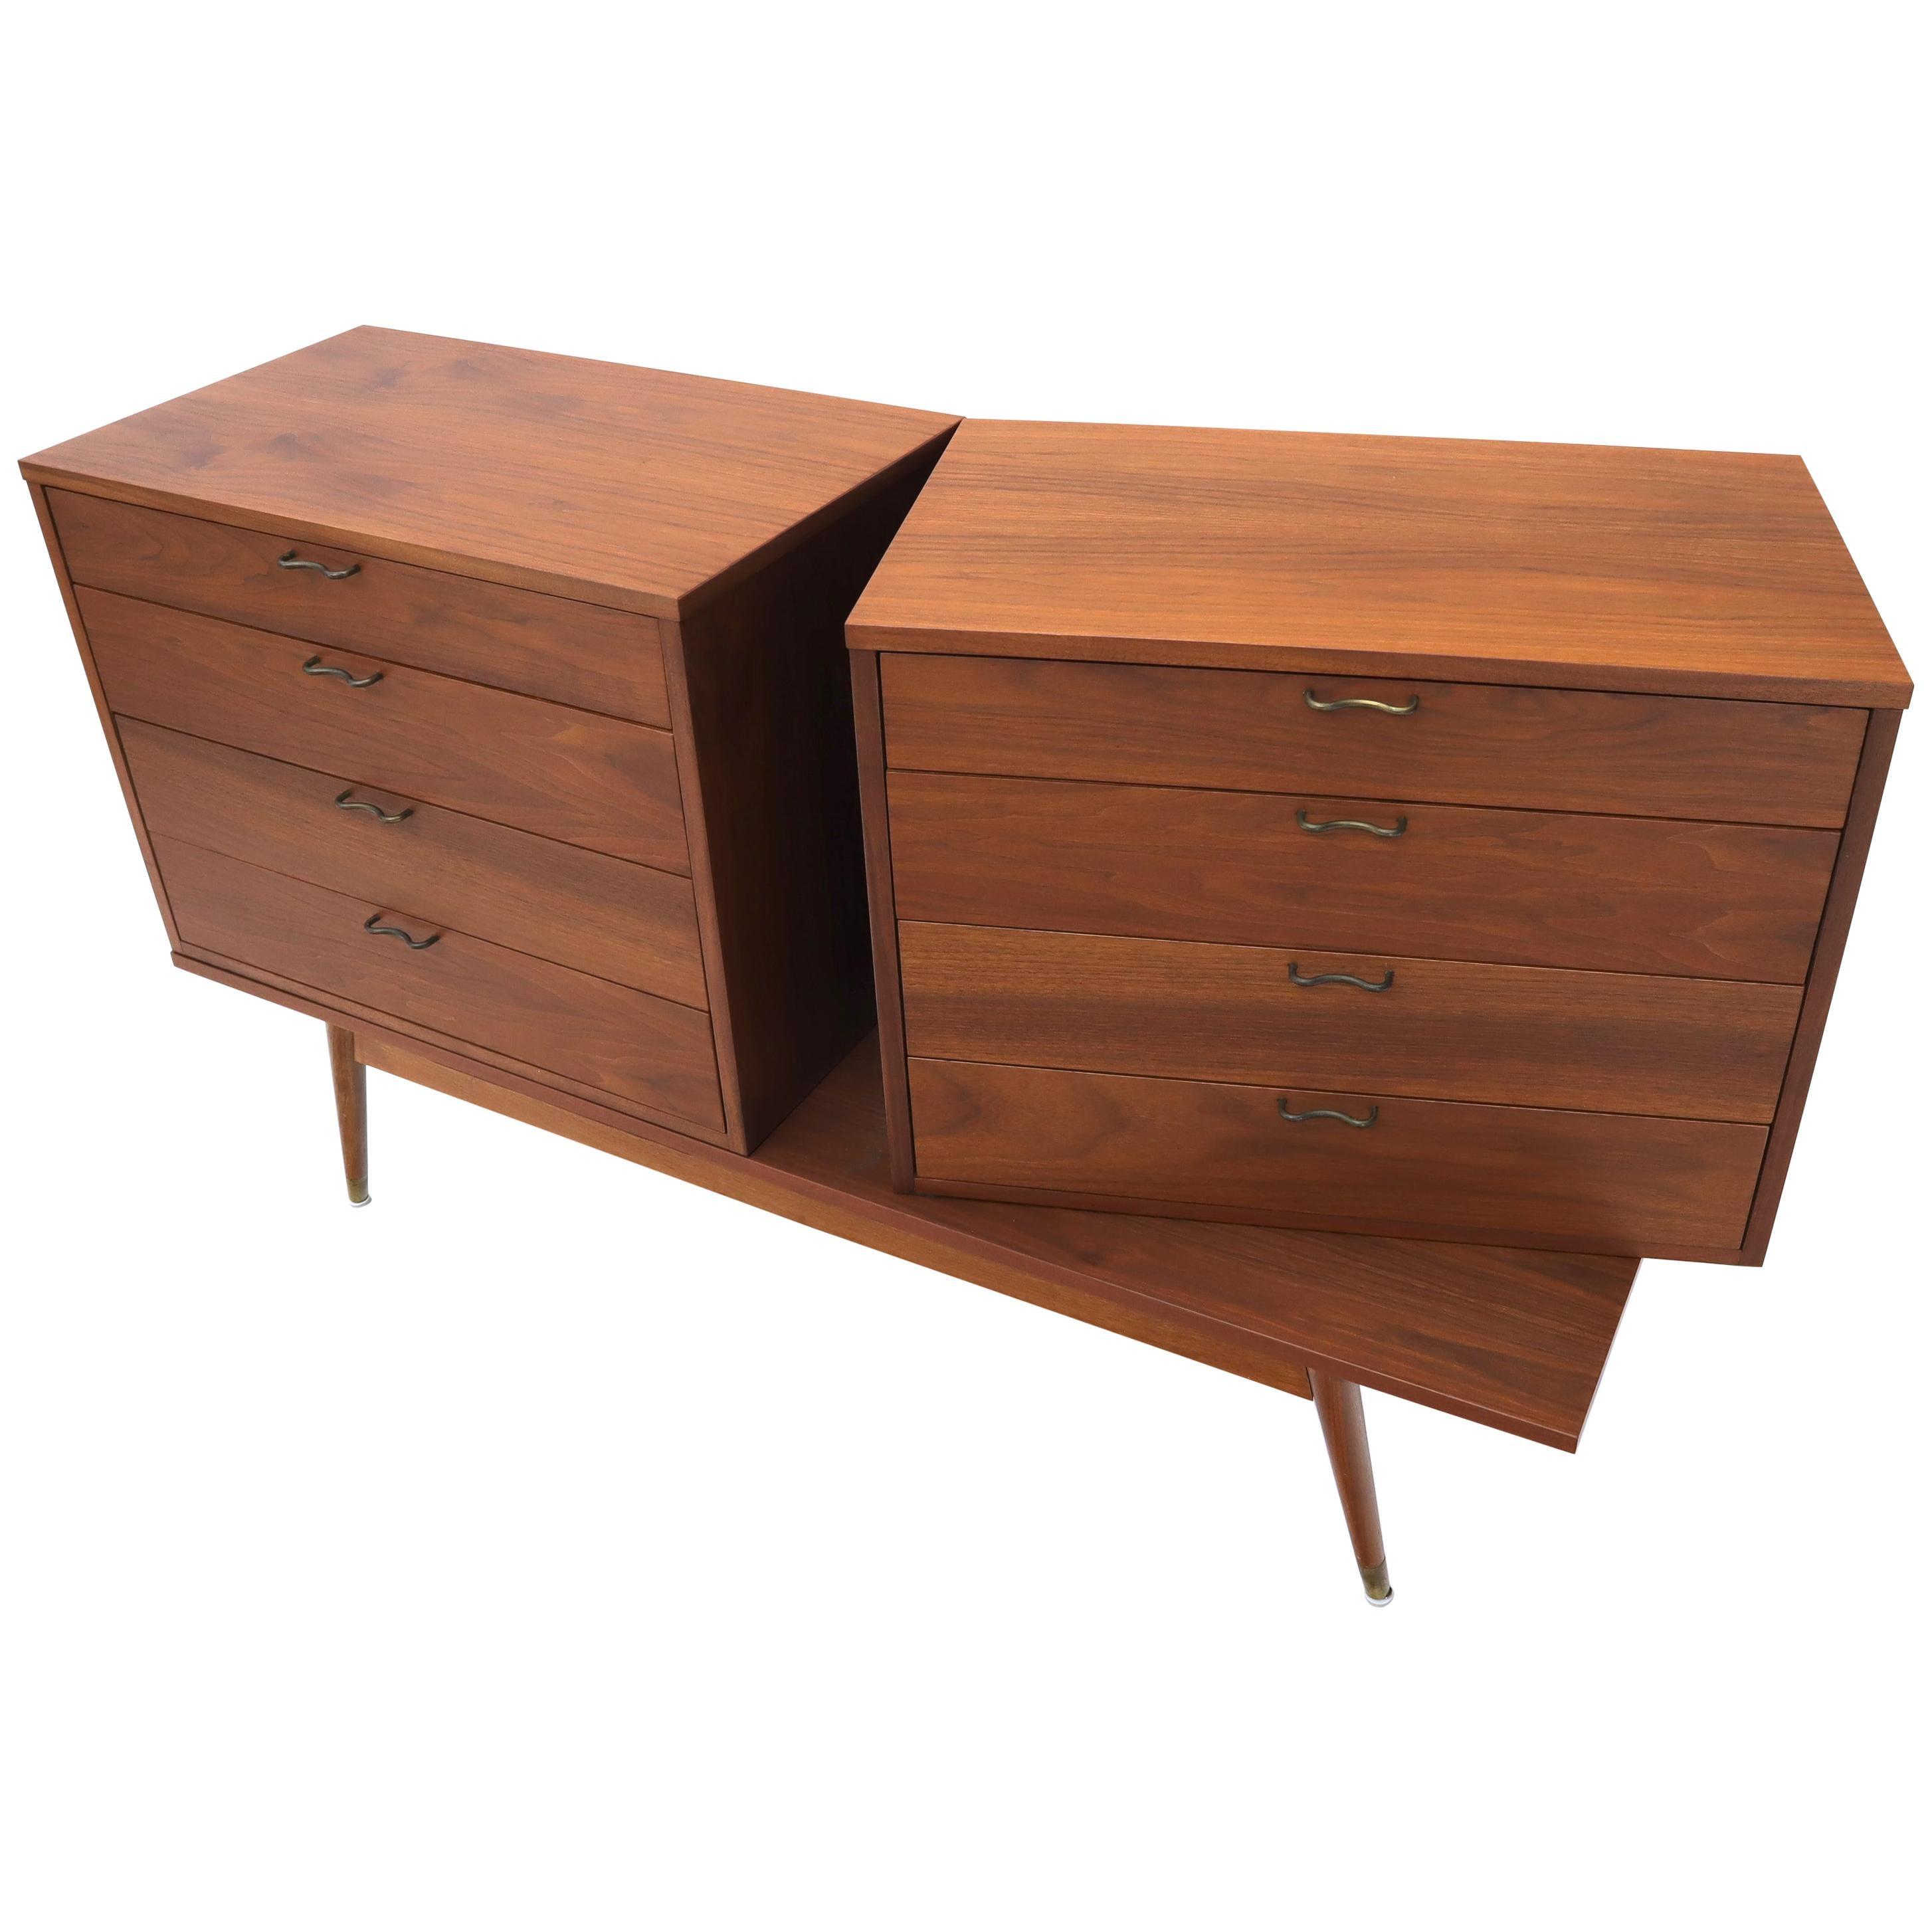 Three Pcs Mid-Century Modern Oiled Walnut Chest Dresser Credenza w/ Waive Pulls